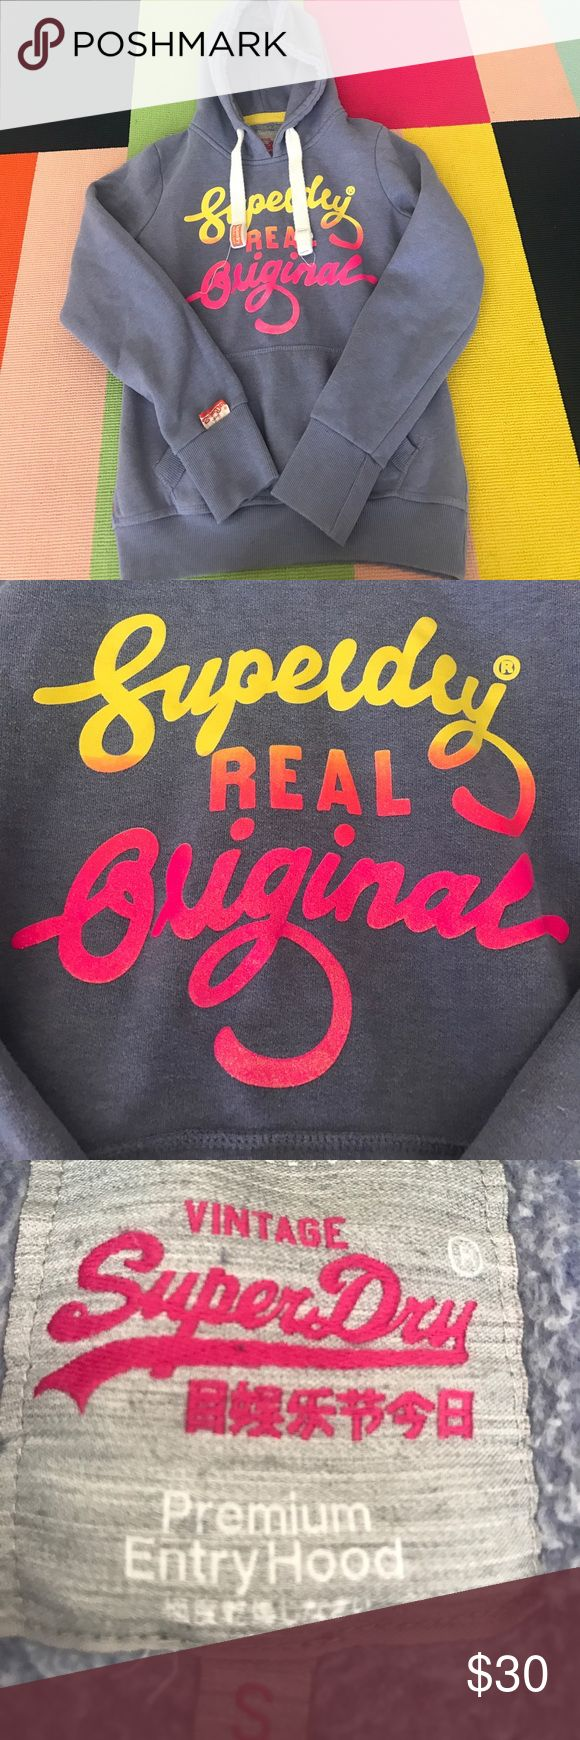 super dry sweatshirt light purple sweatshirt with colored logo Superdry Tops Sweatshirts & Hoodies